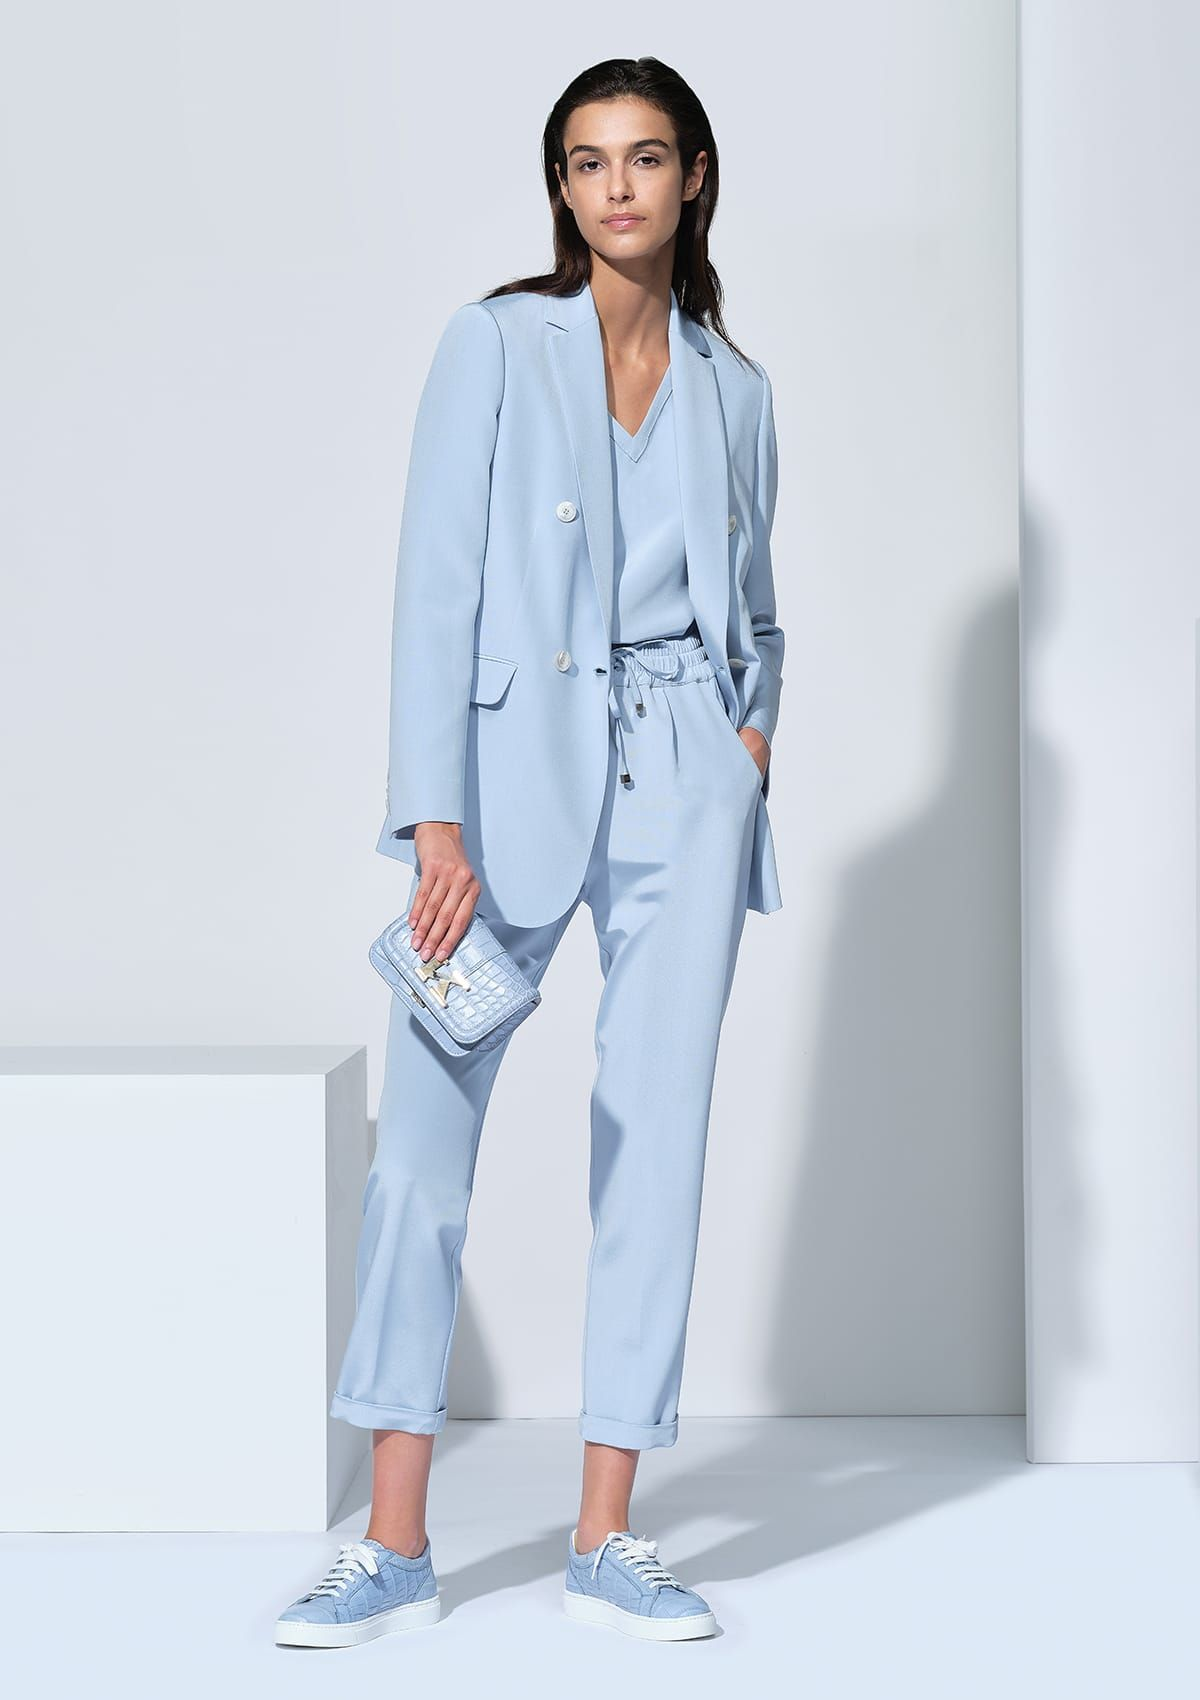 Pin by Tatijana Koksharova on Mode 6  Spring summer fashion